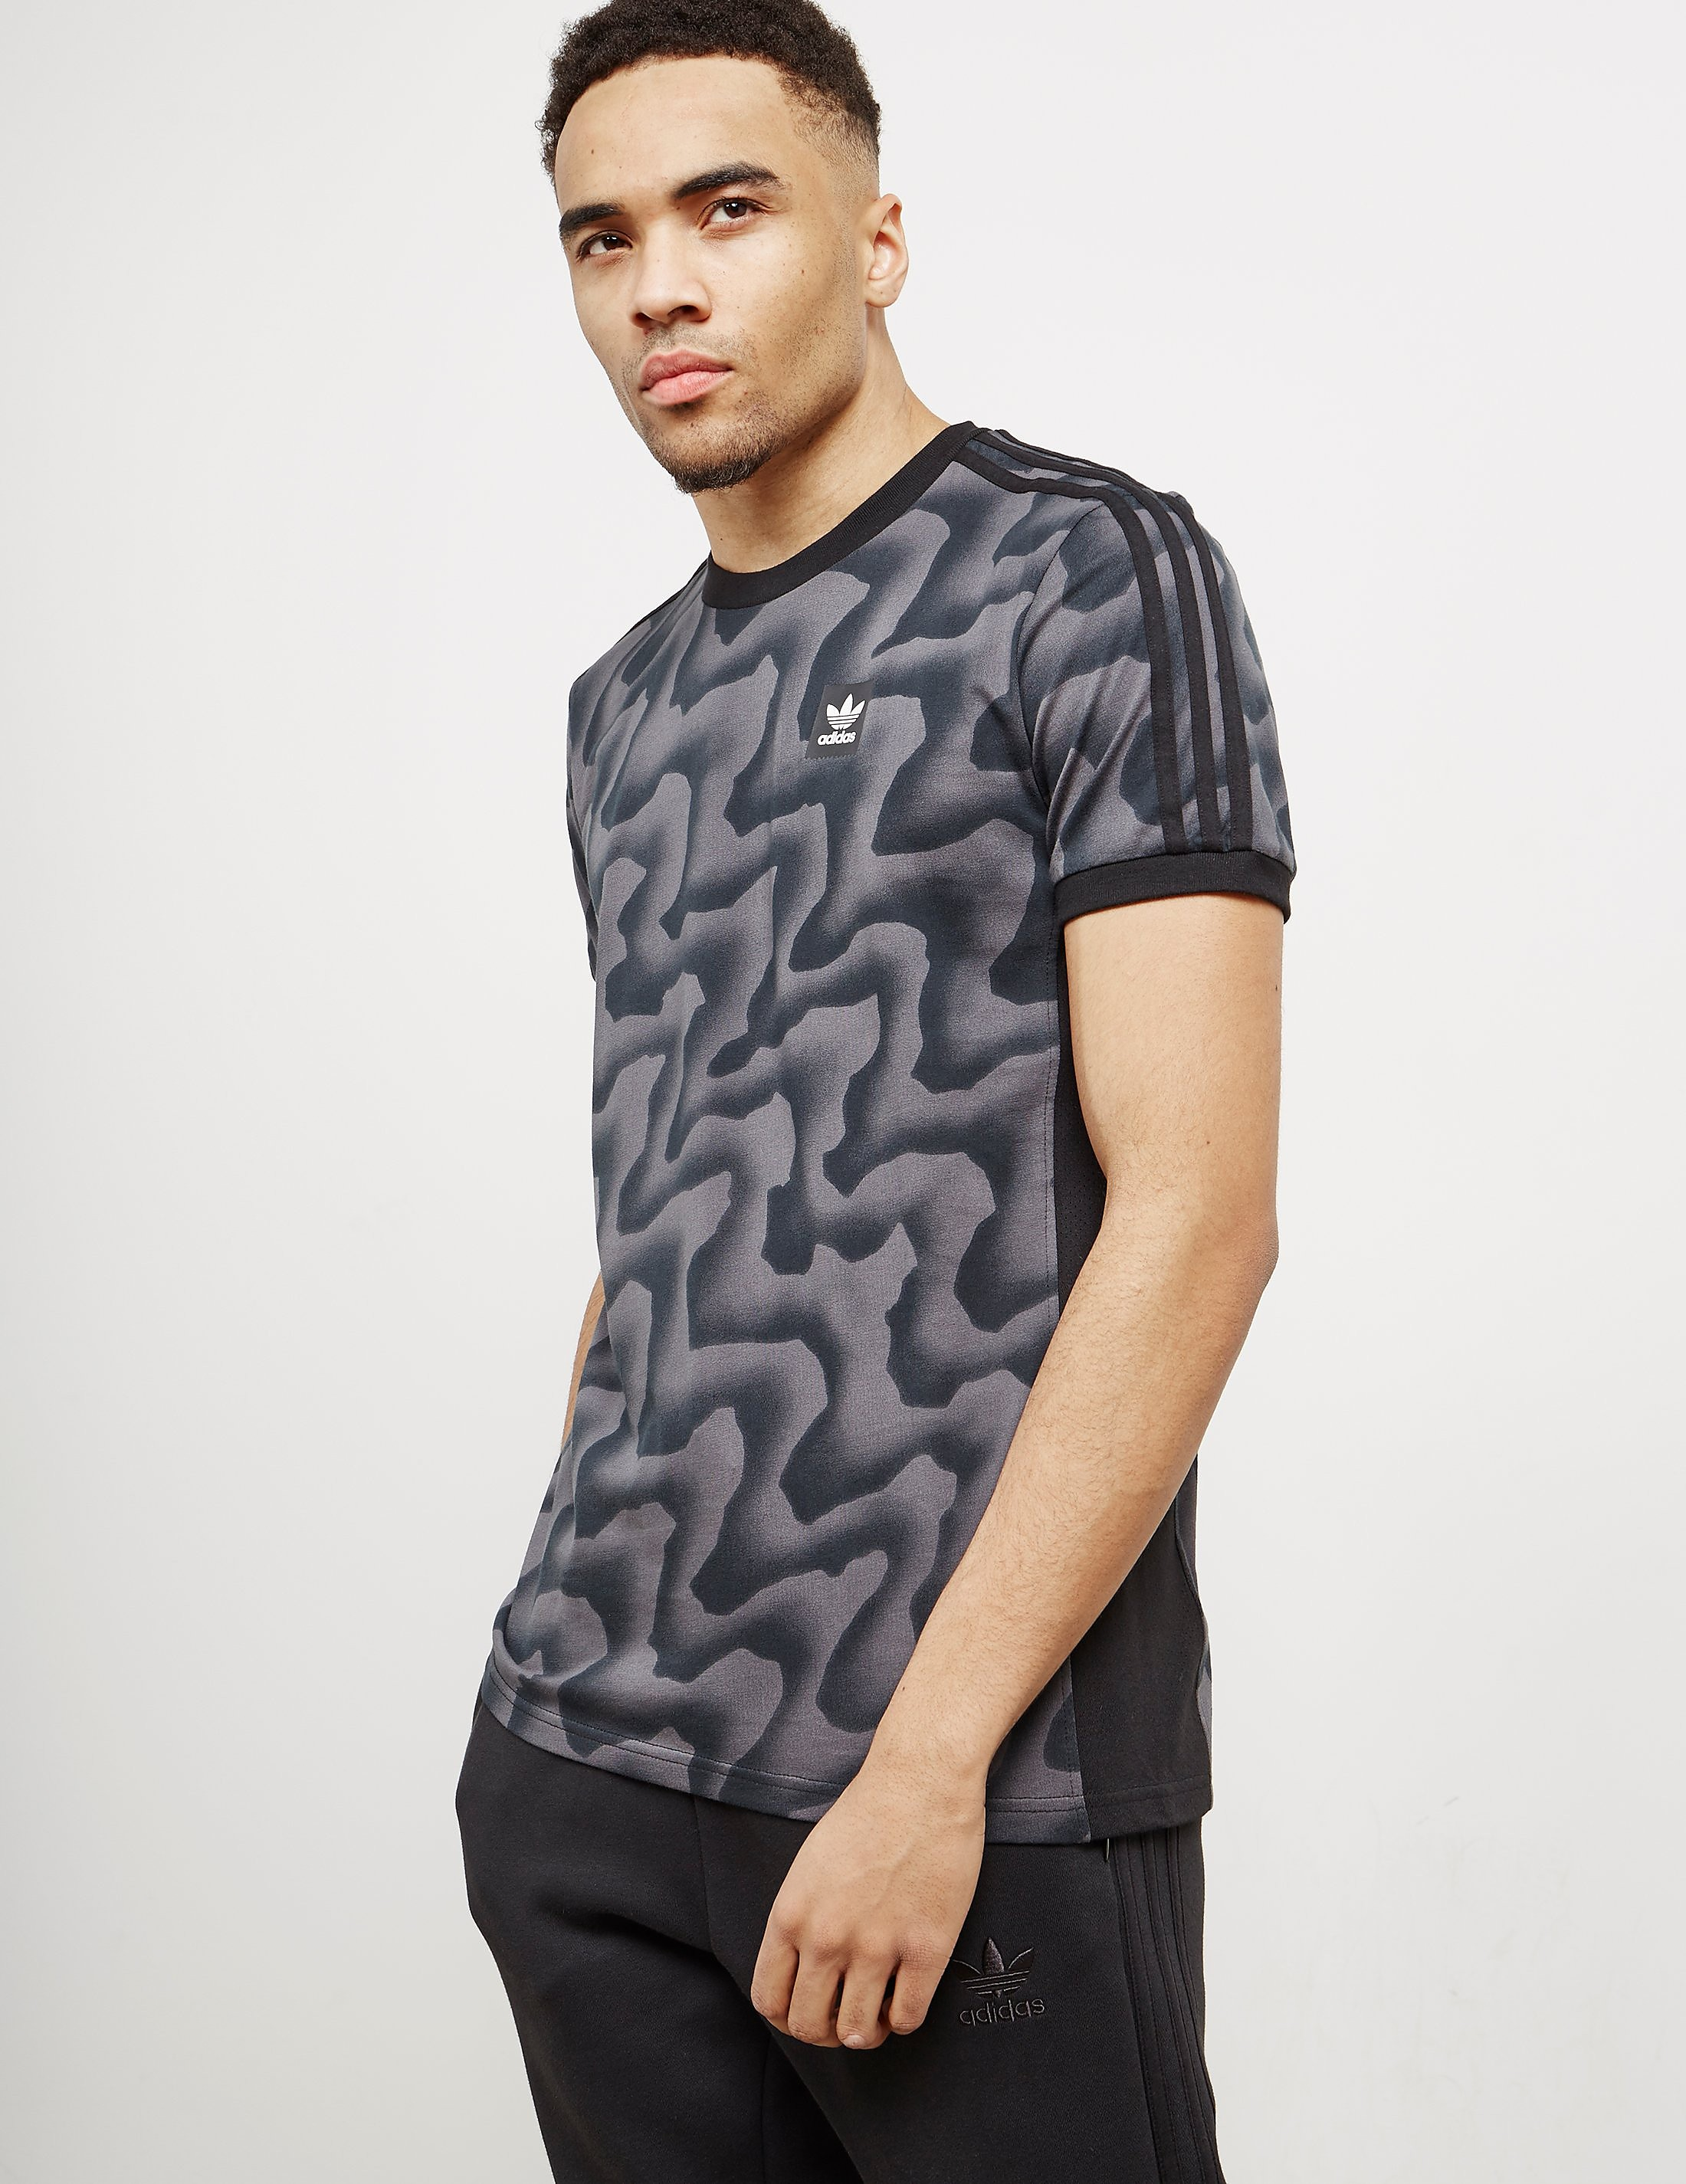 adidas Originals Skateboarding Warp Camo T-Shirt